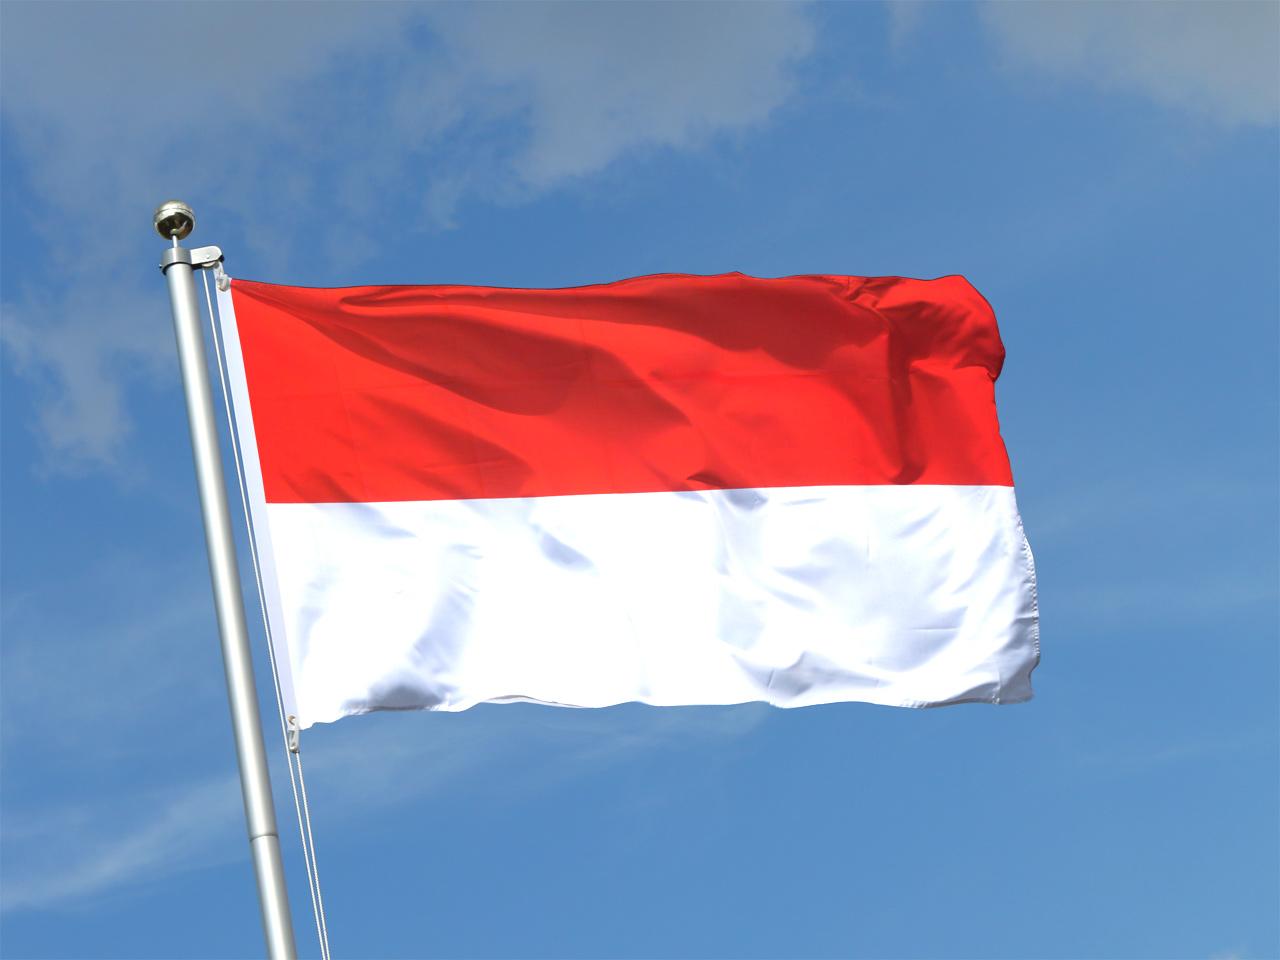 indonesien flagge indonesische fahne kaufen fahnen shop. Black Bedroom Furniture Sets. Home Design Ideas